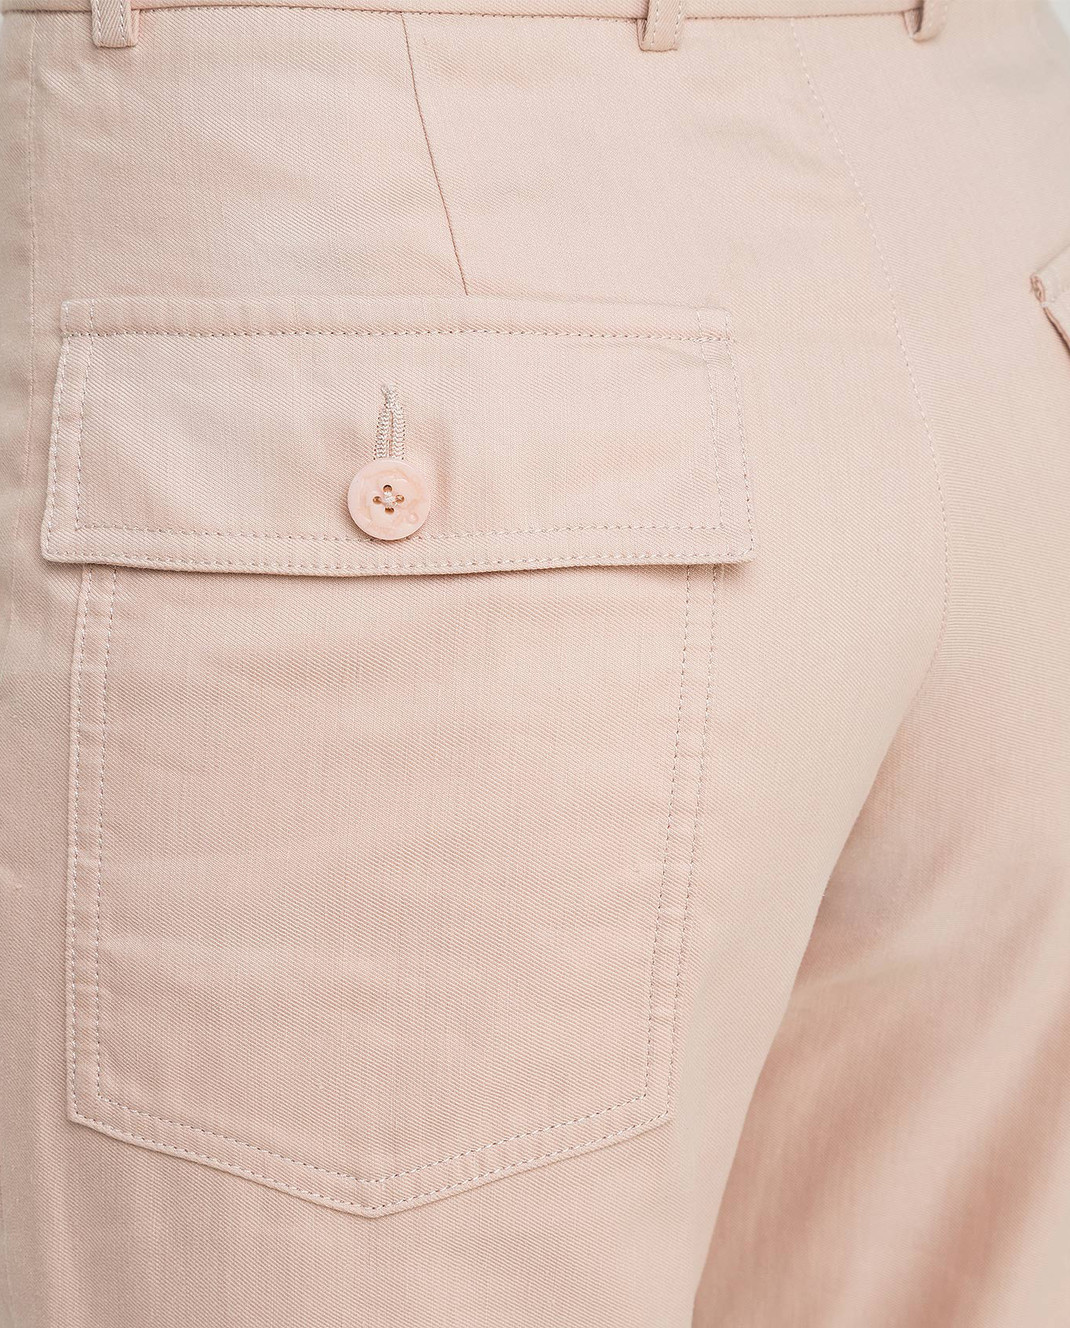 Chloe Светло-бежевые брюки 17EPA58 изображение 5